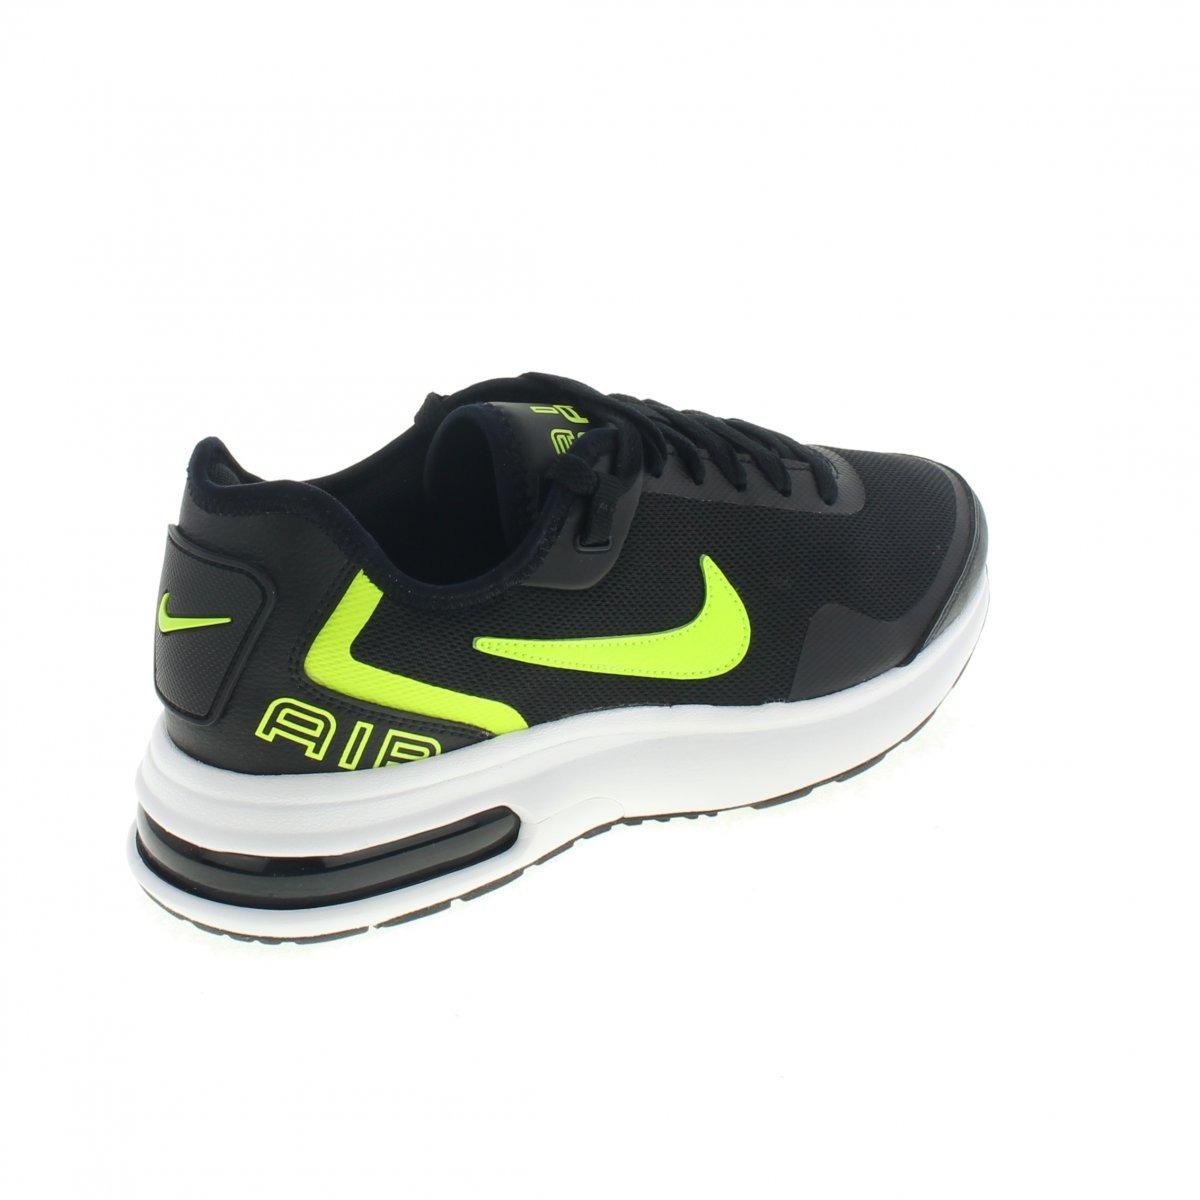 d84b02890b18 tenis nike air max lb ah7336-003 masculino original. Carregando zoom.